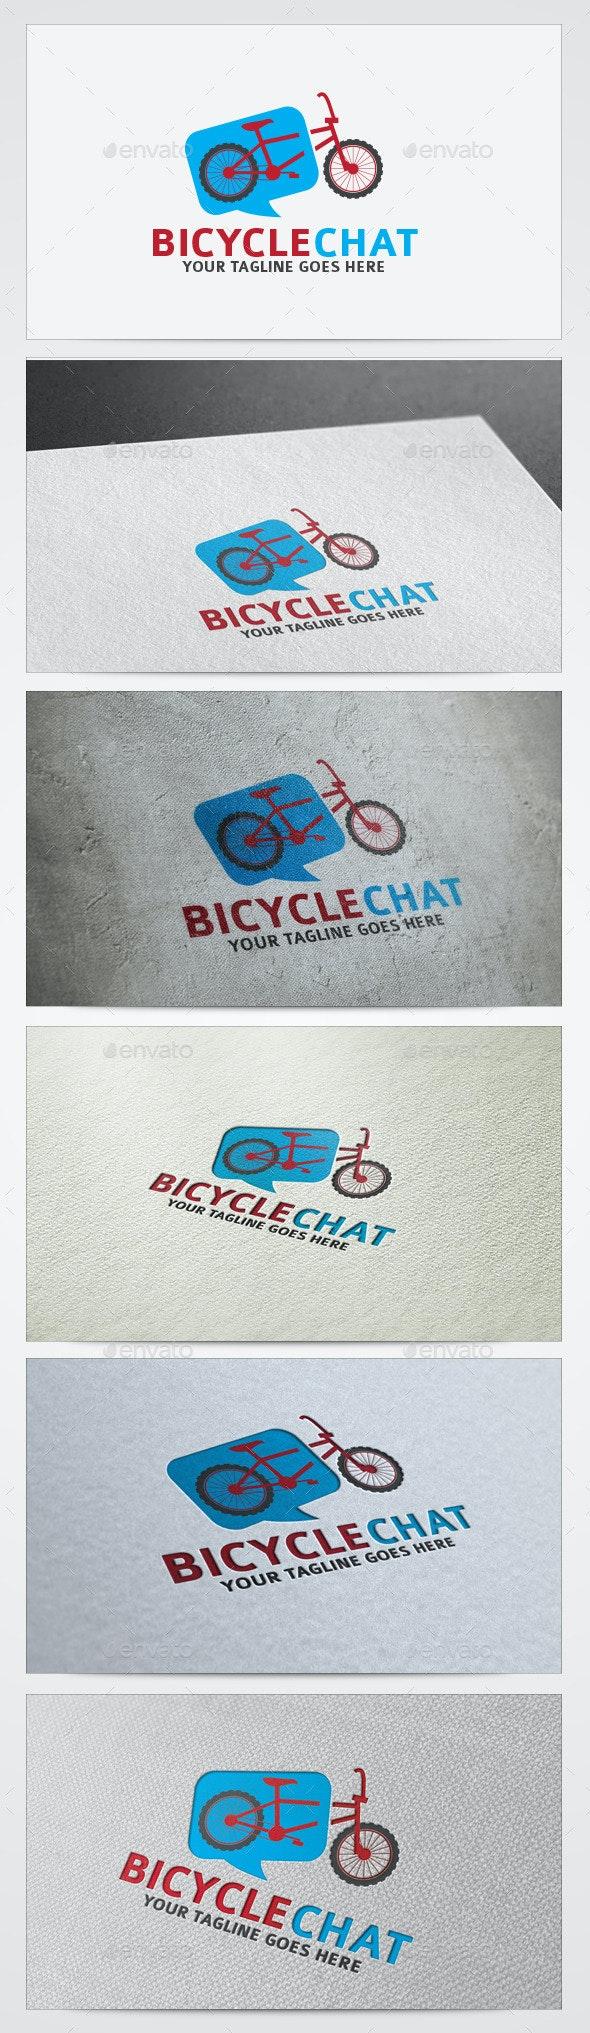 Bicycle Chat Logos Templates - Vector Abstract